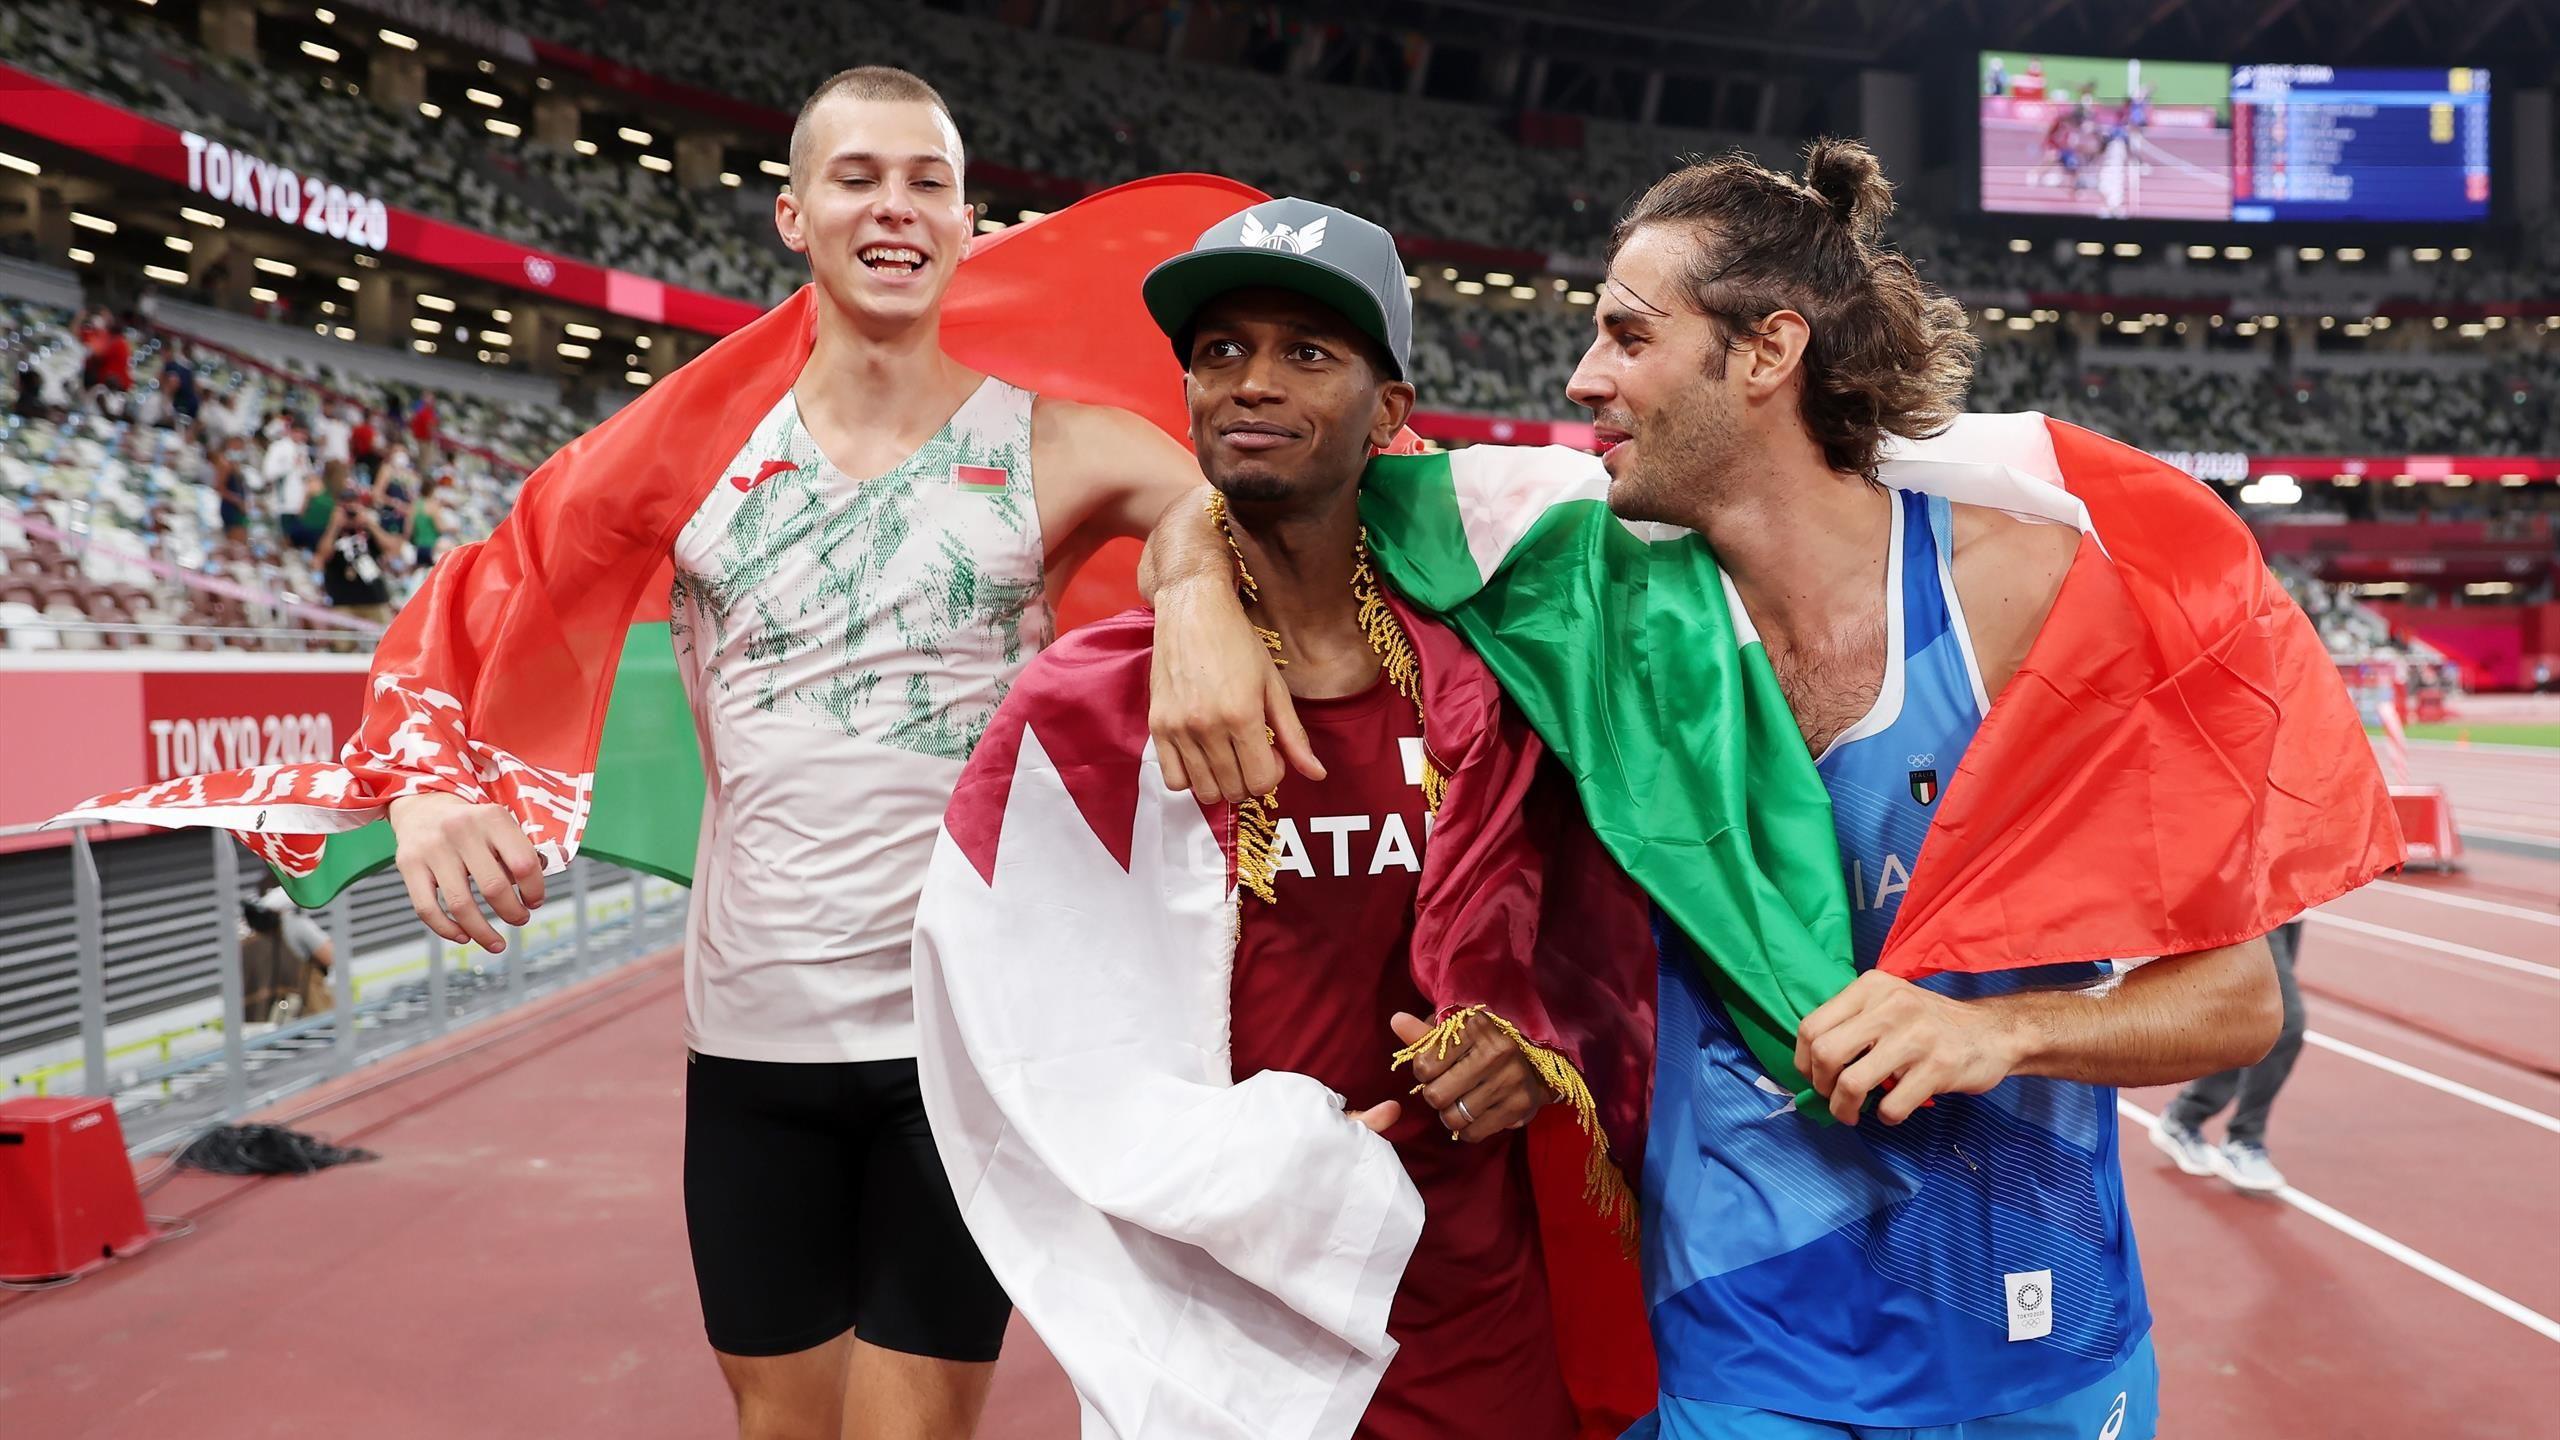 From retirement to gold.. Inspiring story: Mutaz Barshim and Italian rival Gianmarco Tamberi